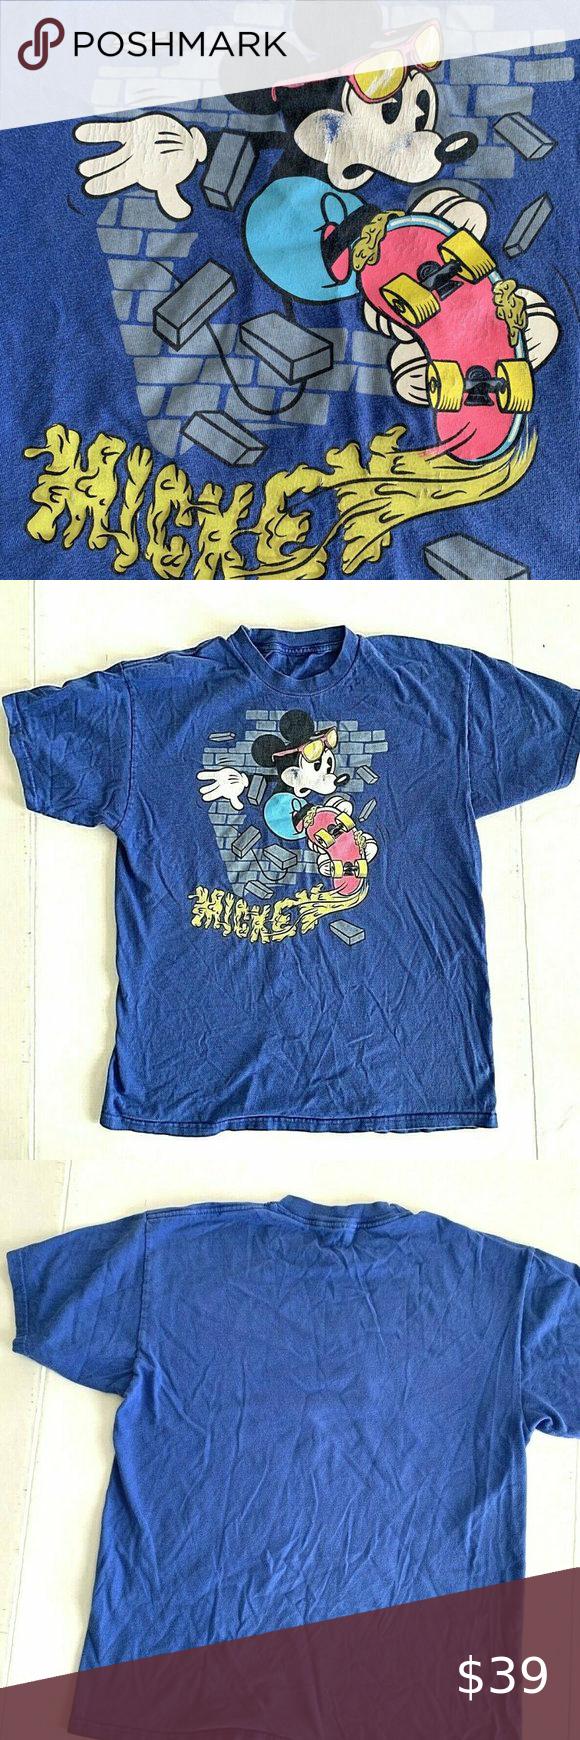 Vintage Disney Mickey Mouse Skateboarding T Shirt In 2020 Vintage Disney Disney Mickey Mouse Mickey Mouse